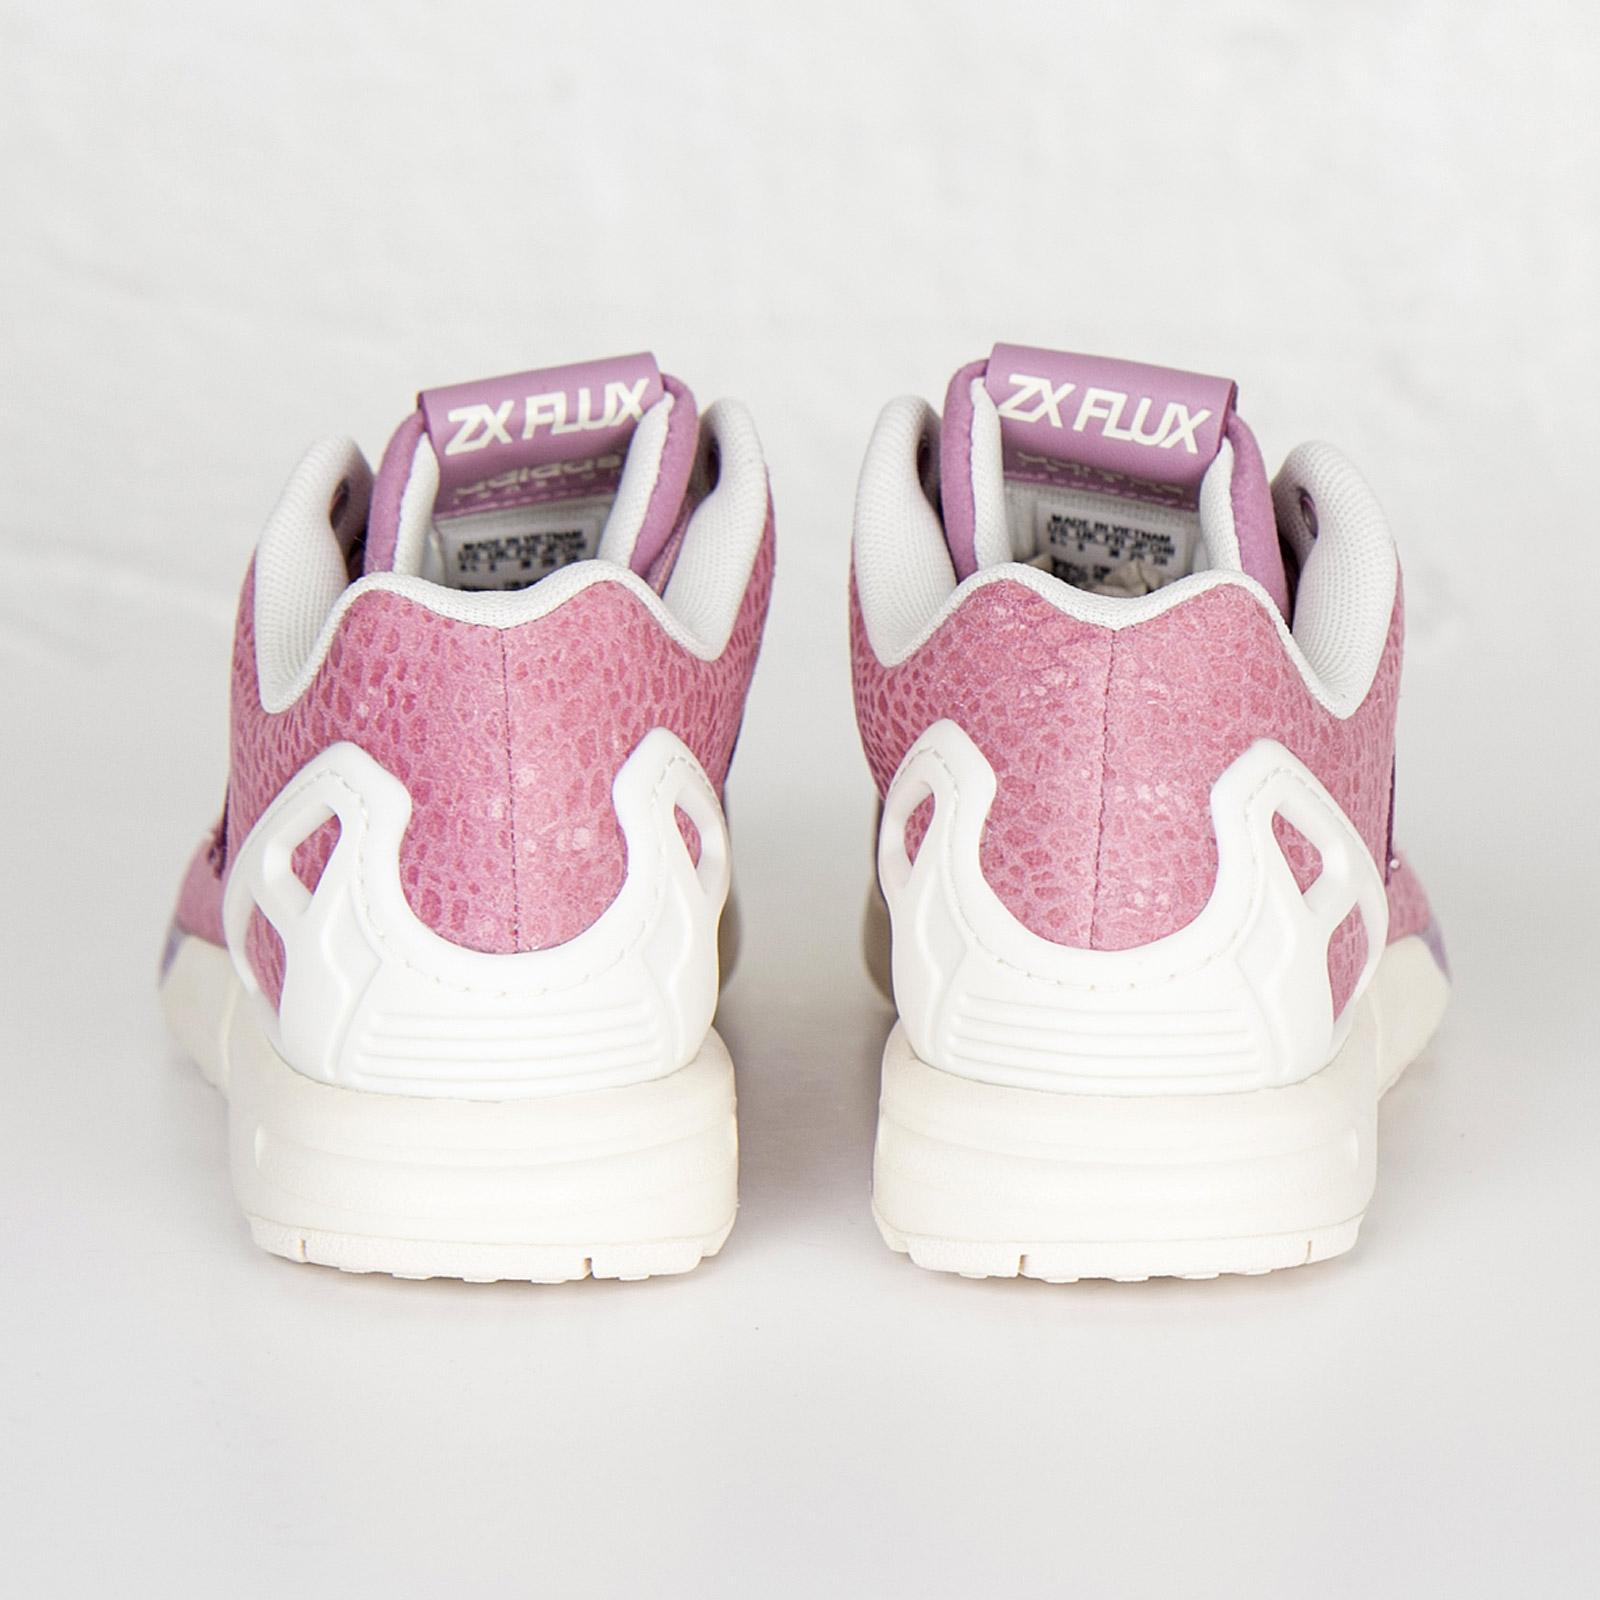 859e742953e60 adidas ZX Flux W - B35311 - Sneakersnstuff